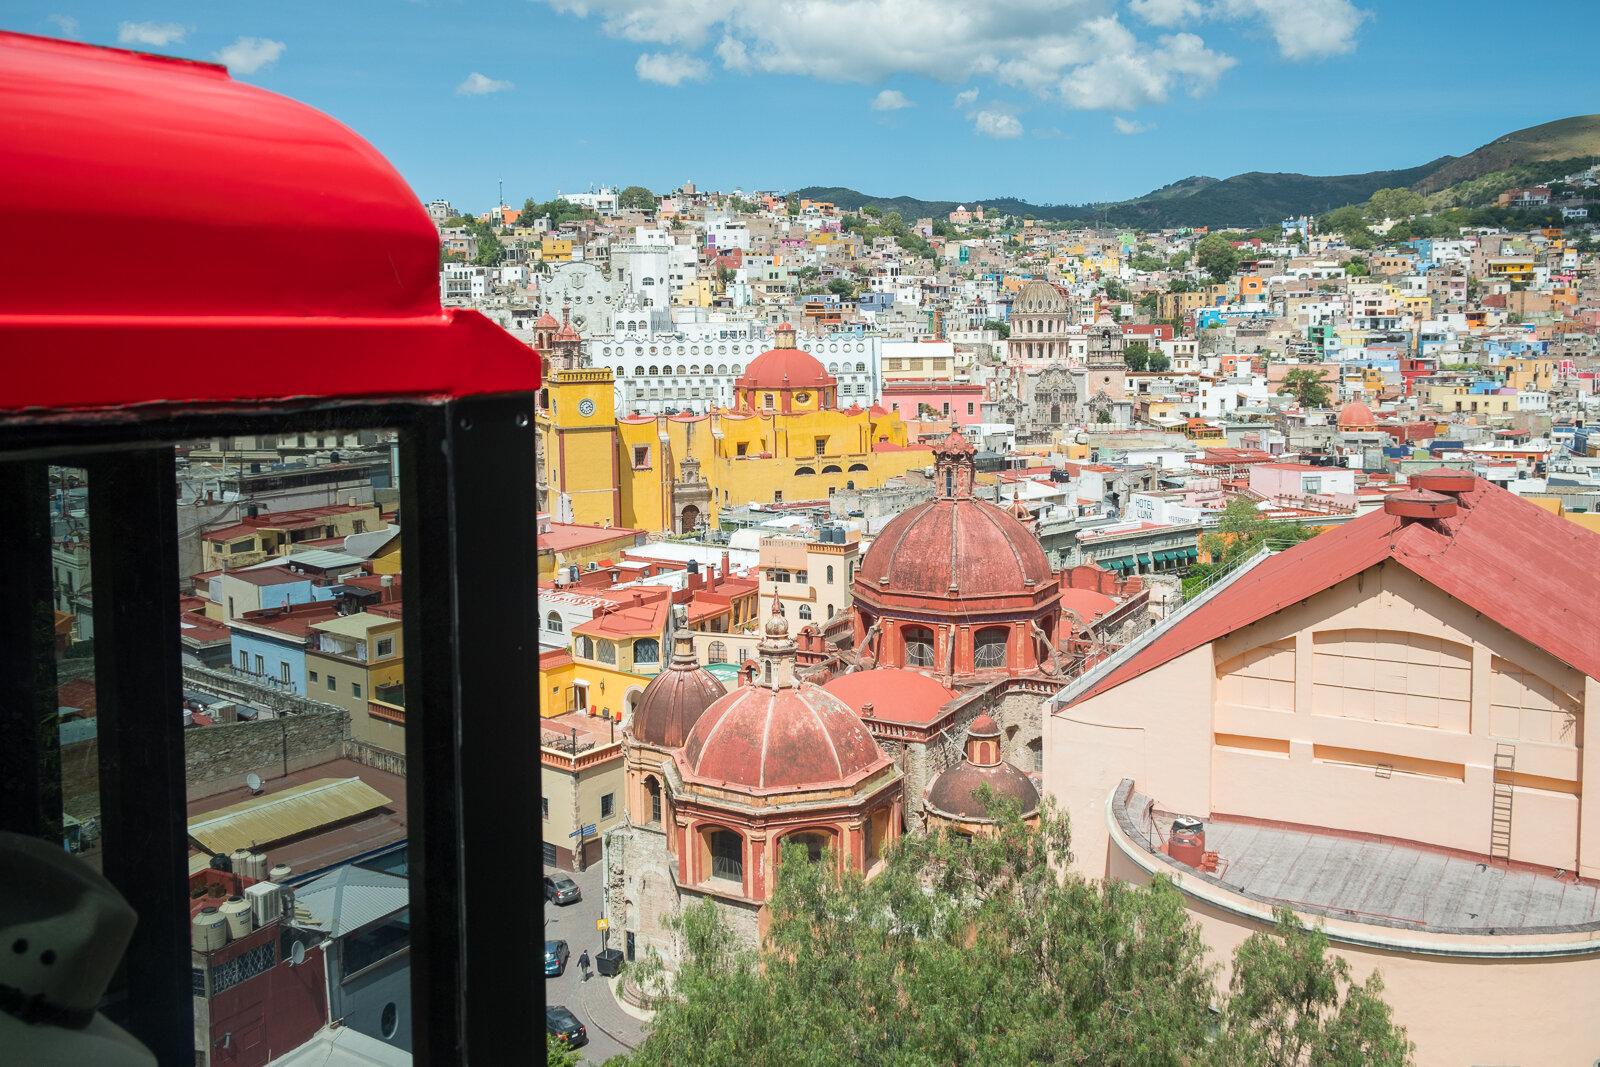 2019.10.8_Mexico_Guanajuato9_Britt first year.jpg